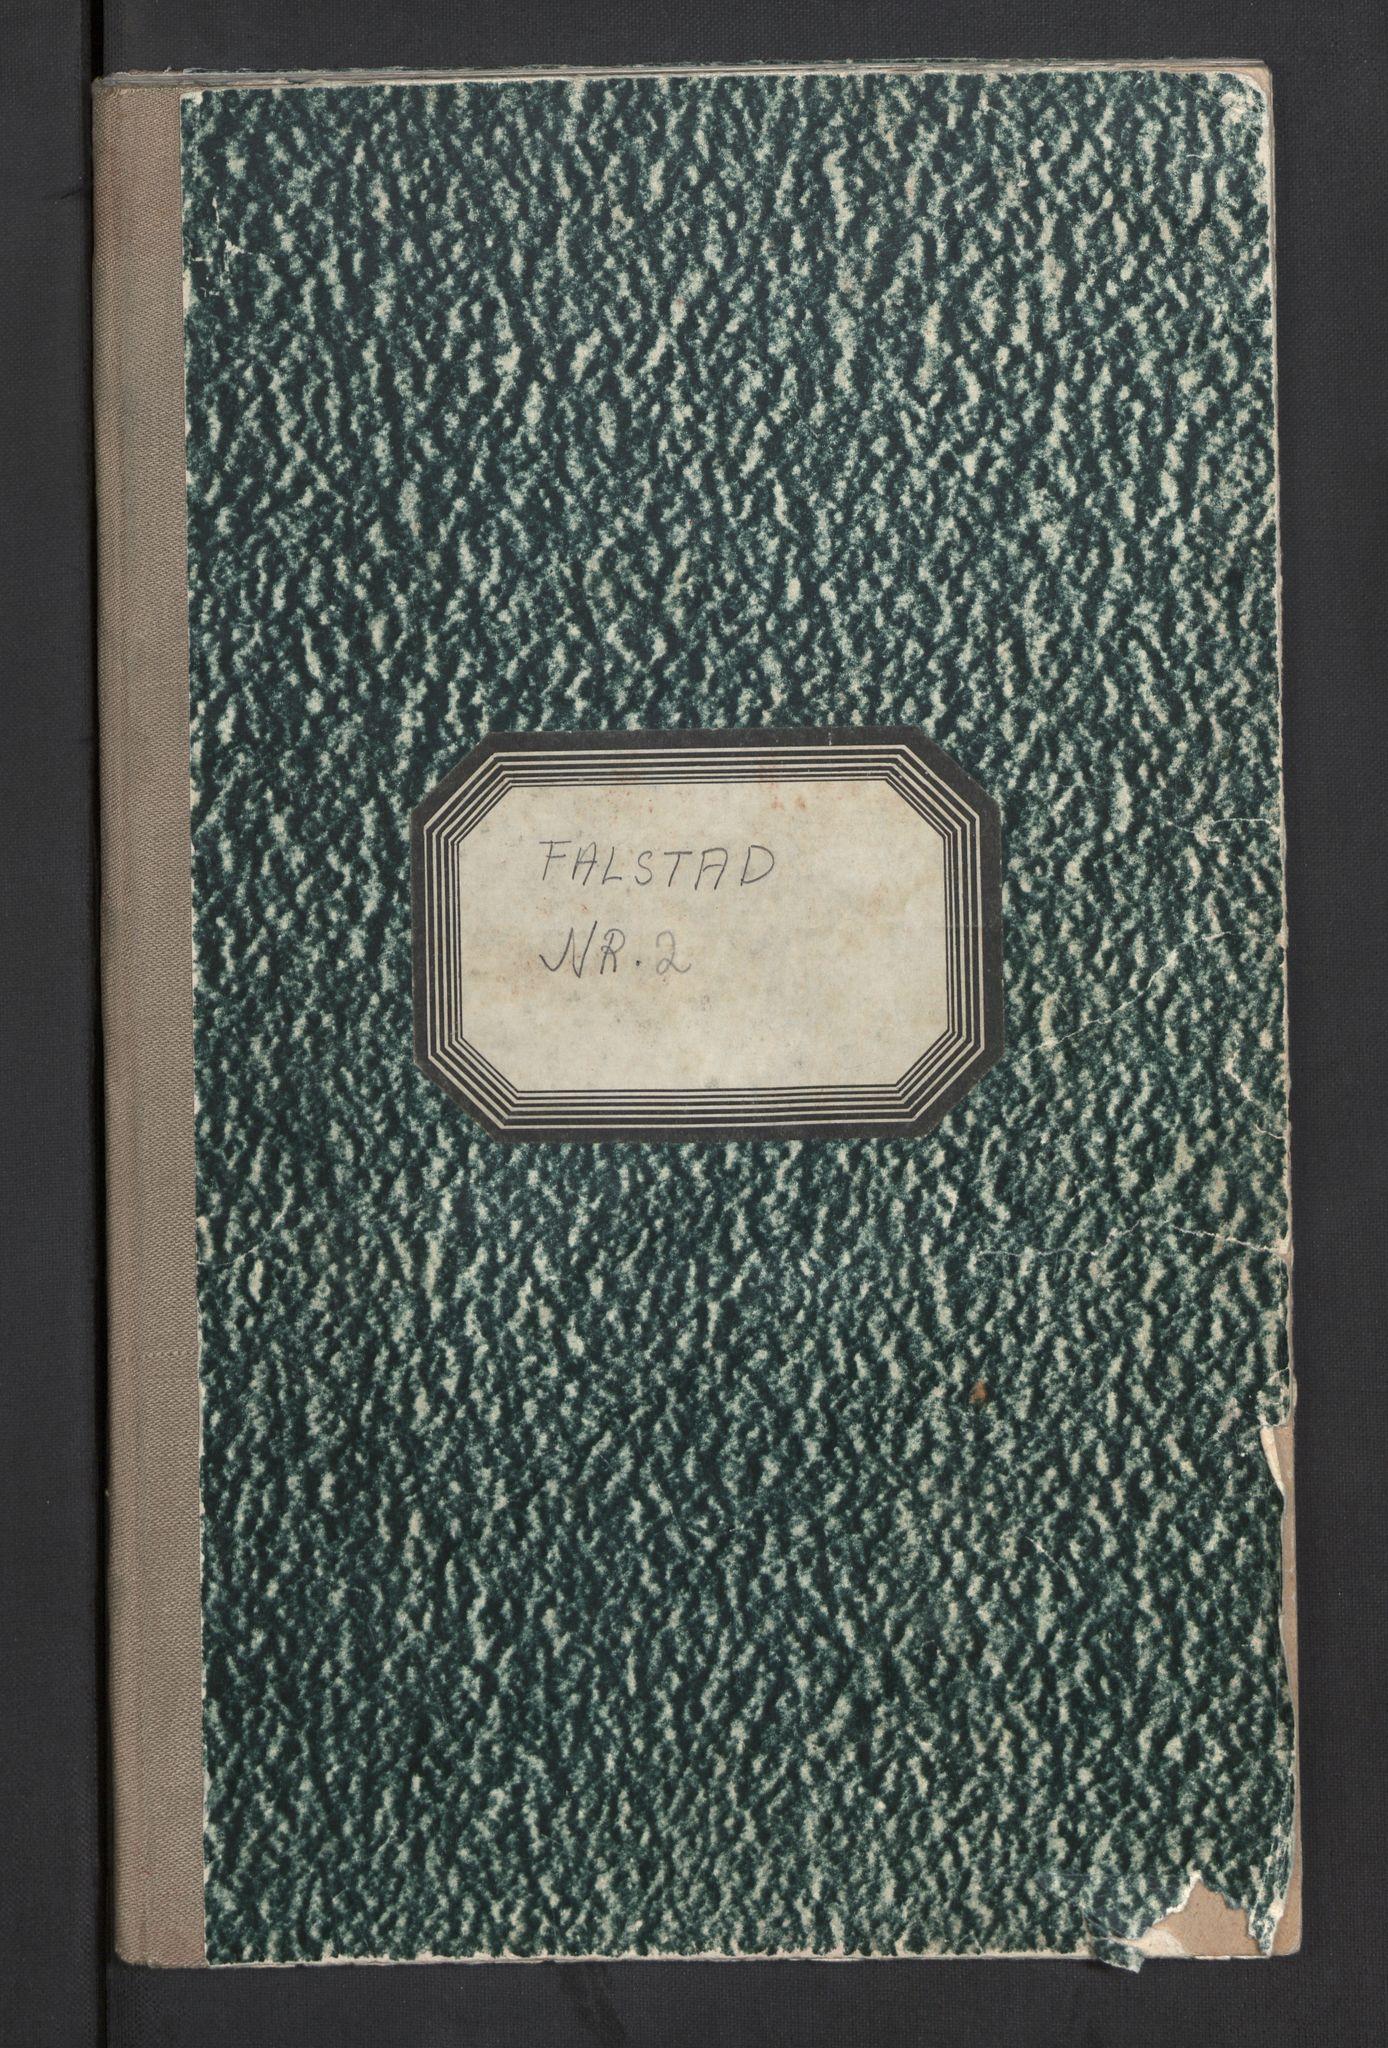 RA, Befehlshaber der Sicherheitspolizei und des SD, F/Fc/L0017: Protokoller over fangenes ankomst og avreise nr. 2,3 og 4, 1941-1945